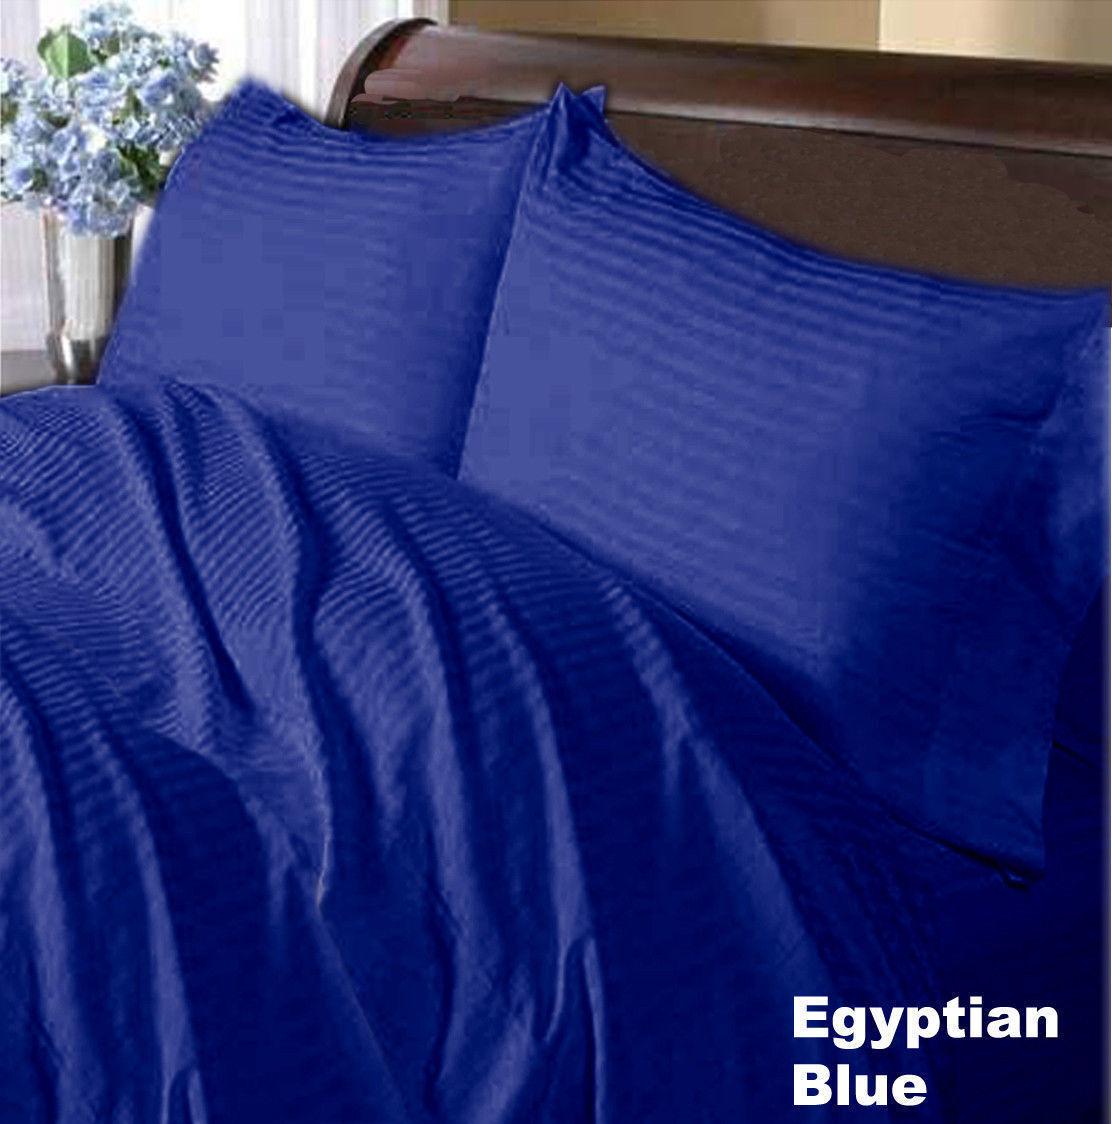 Bedding Items Egyptian Cotton 1000 Thread Count All Größes Egyptian Blau Stripe